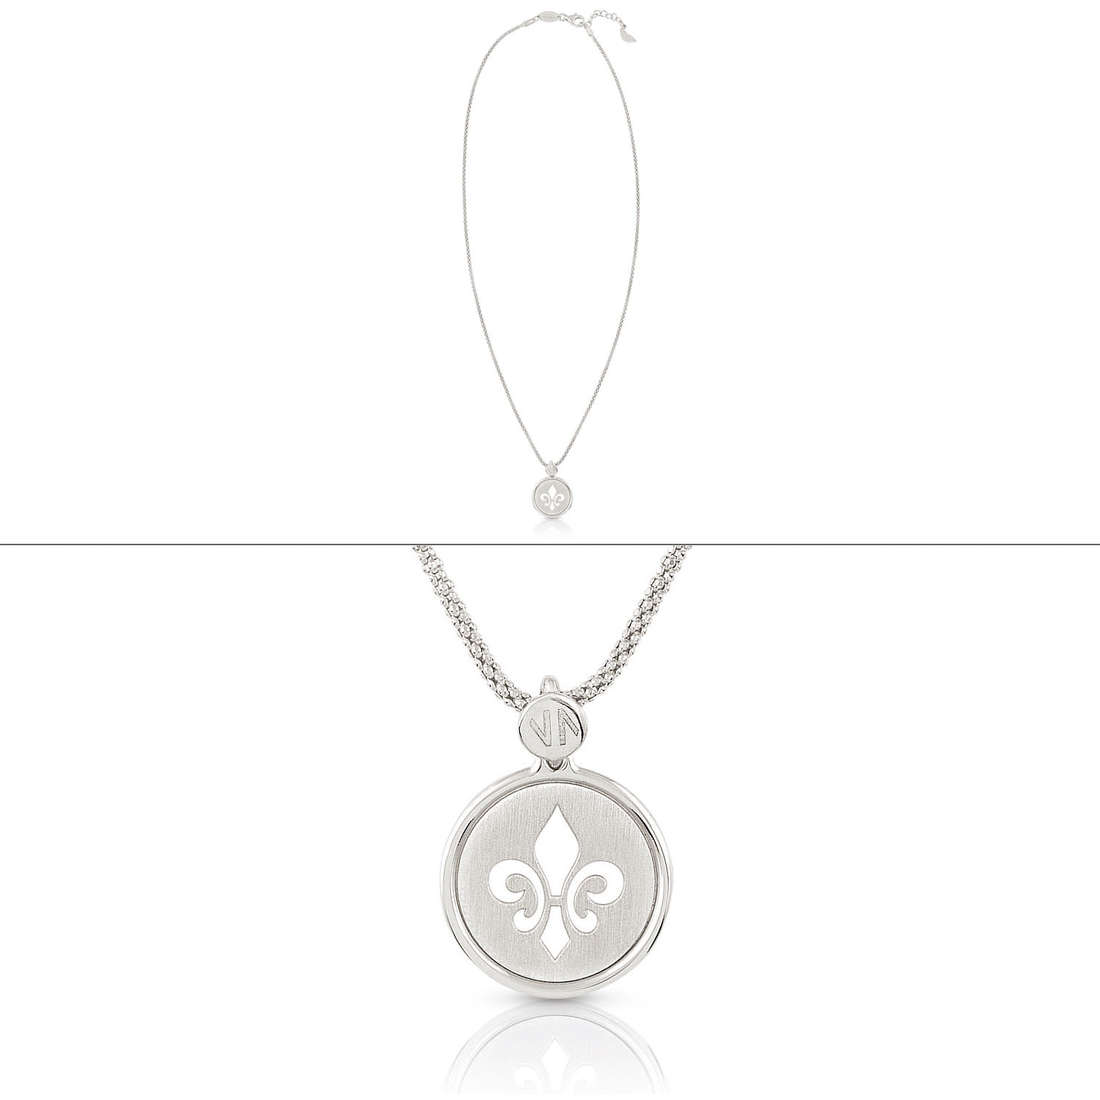 necklace unisex jewellery Nomination 145405/010